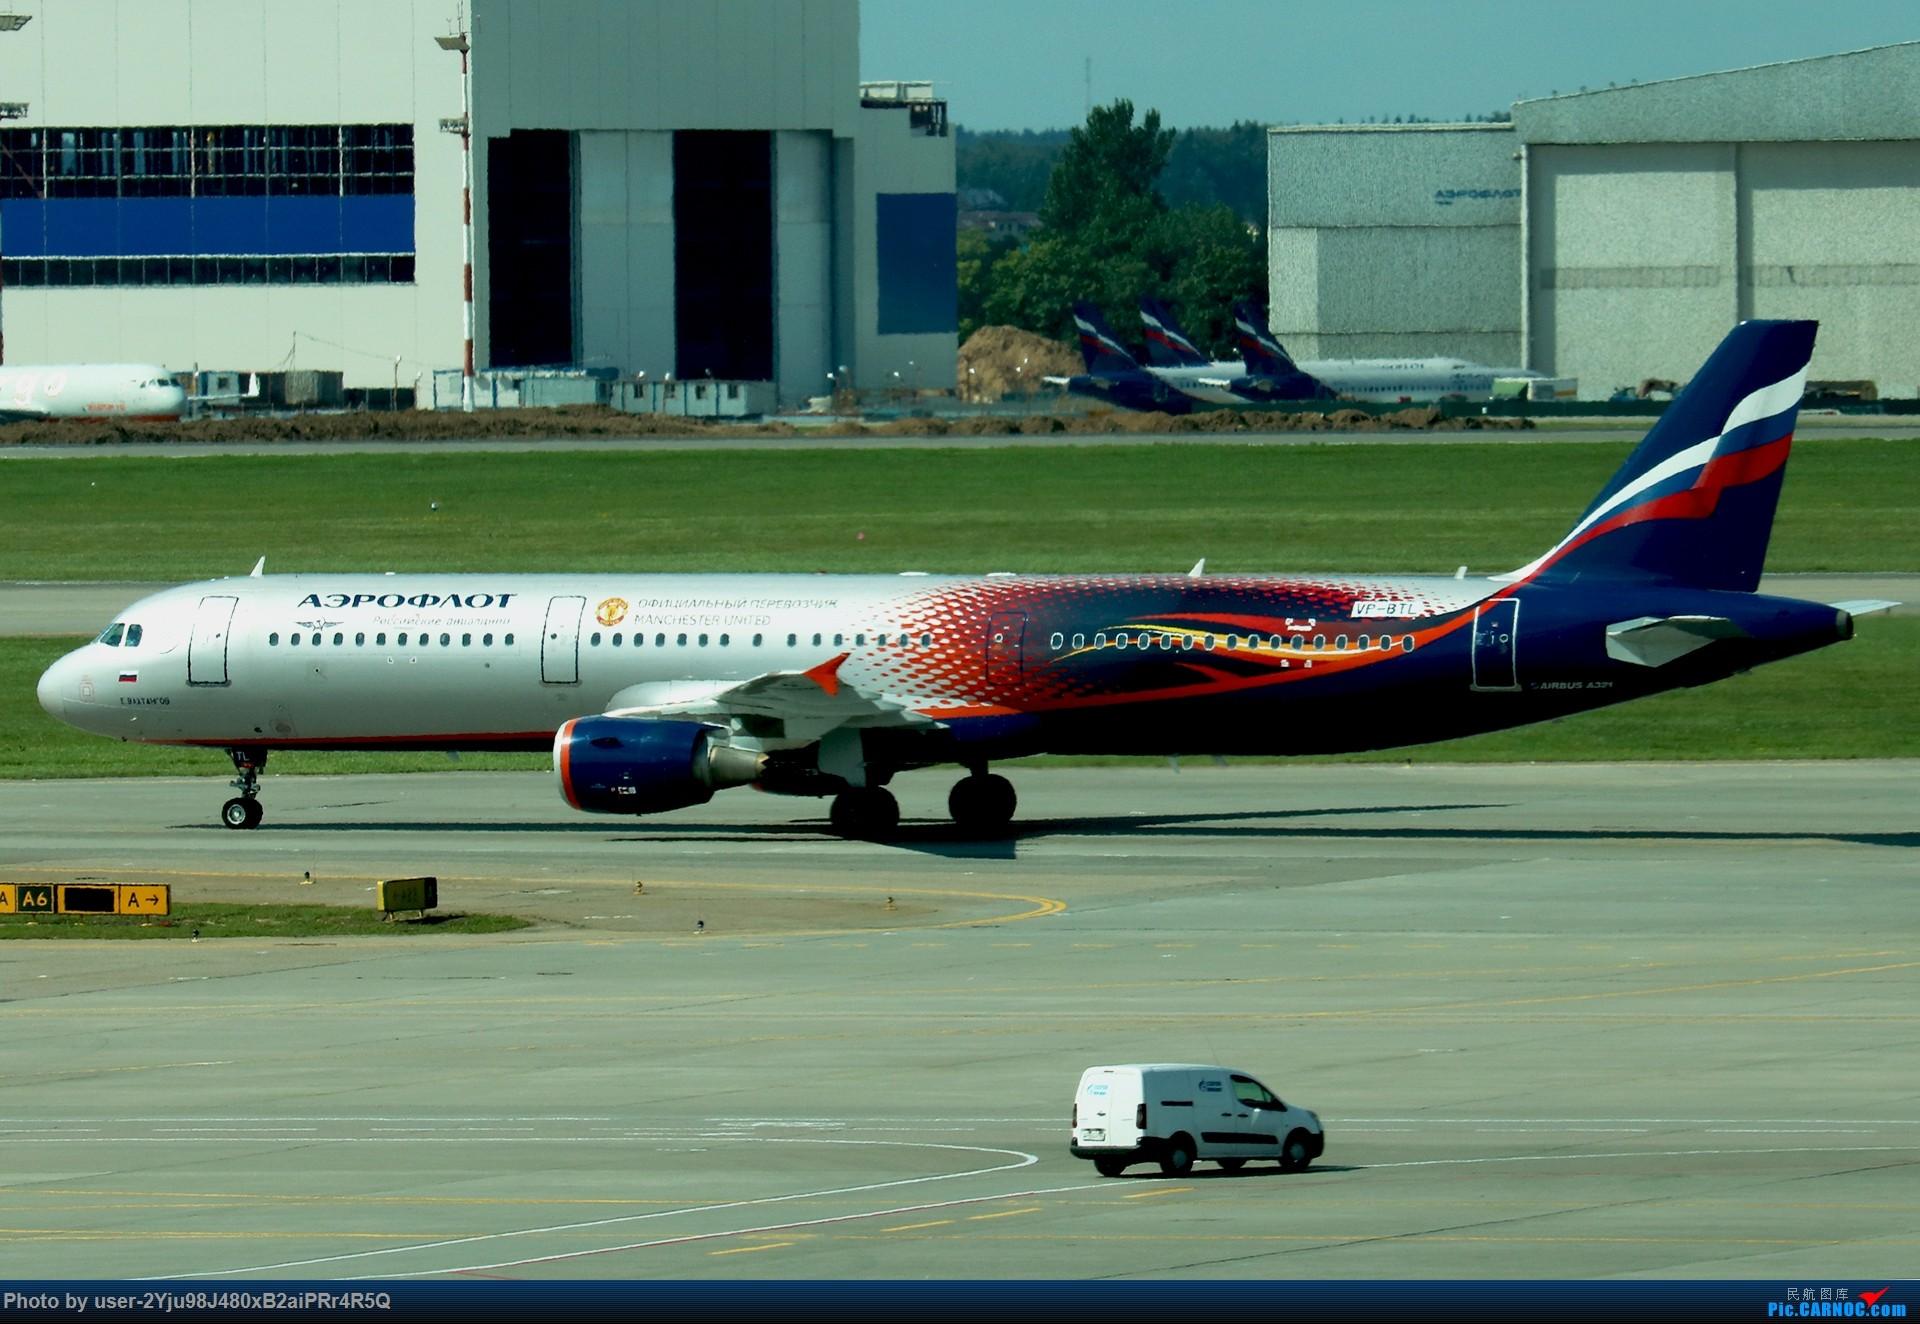 Re:[原创]LIULIU Sheremetyevo的漫游 Aeroflot毛航篇 AIRBUS A321-211 VP-BTL 俄罗斯谢诺梅杰沃机场